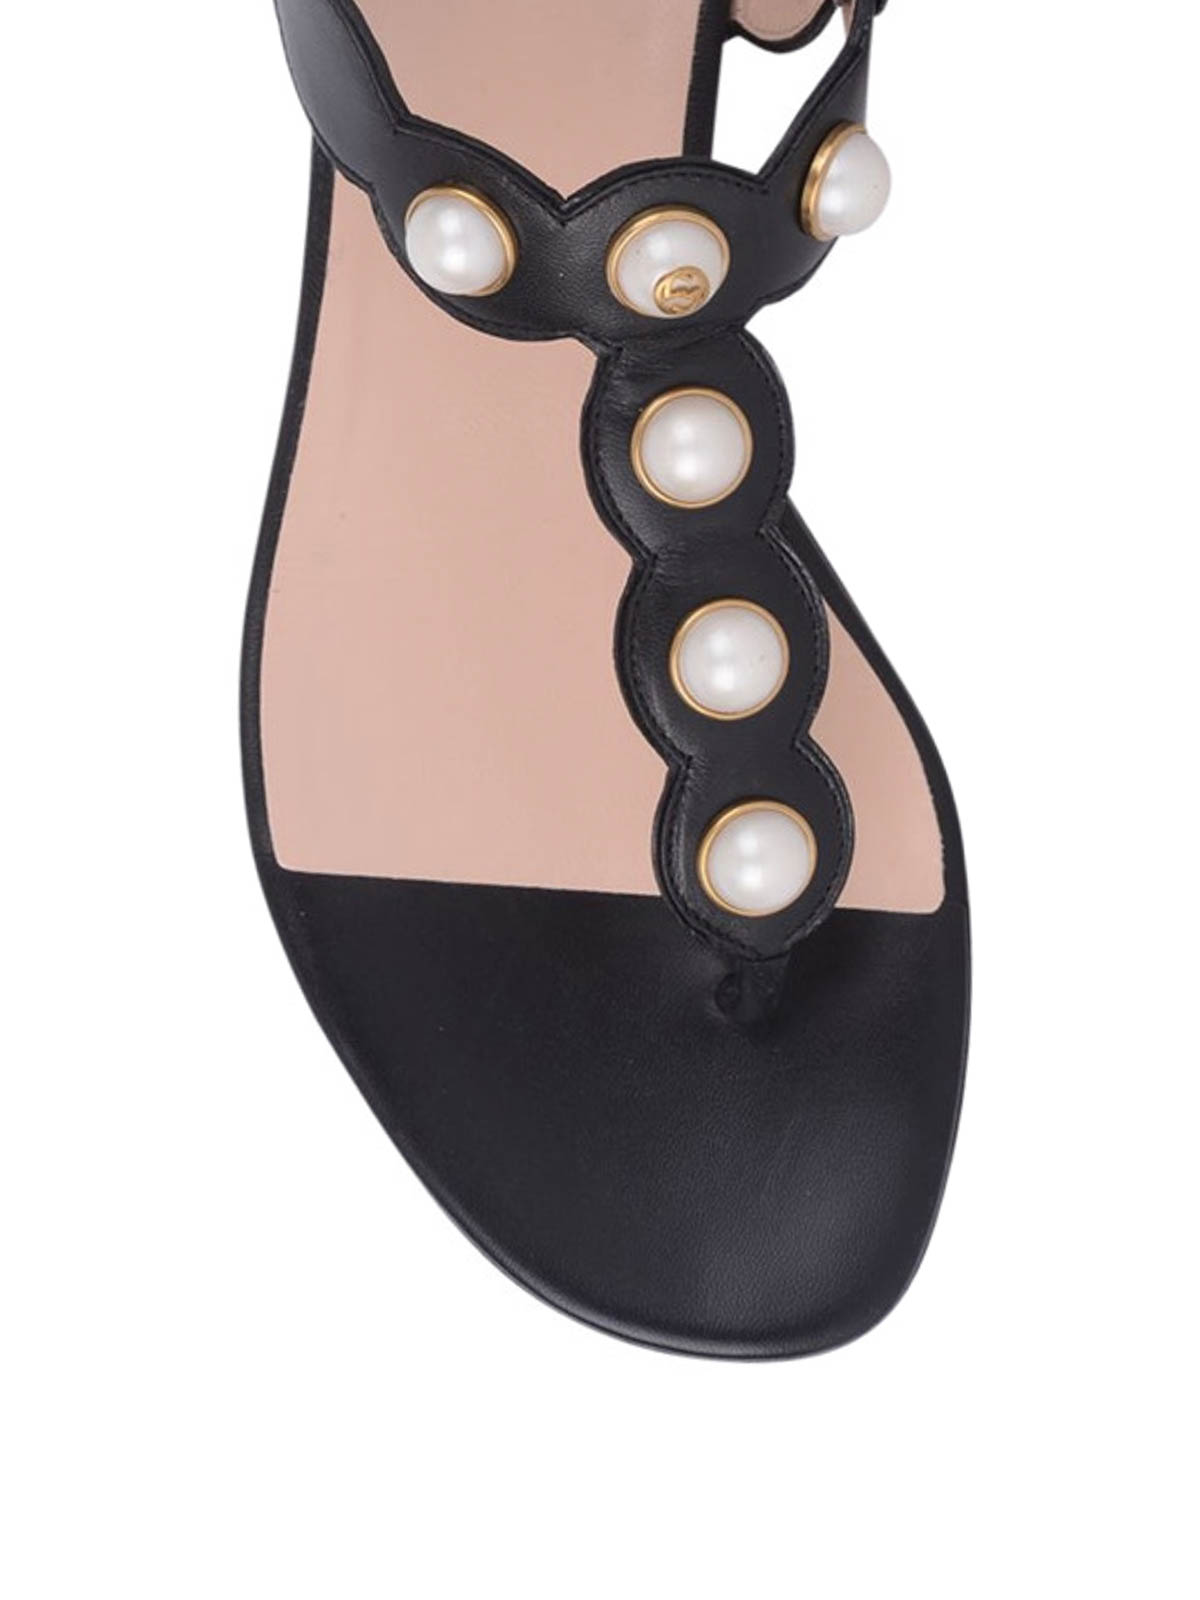 87985bc081e Gucci - Pearl embellished flat sandals - sandals - 424085 C9D00 1000